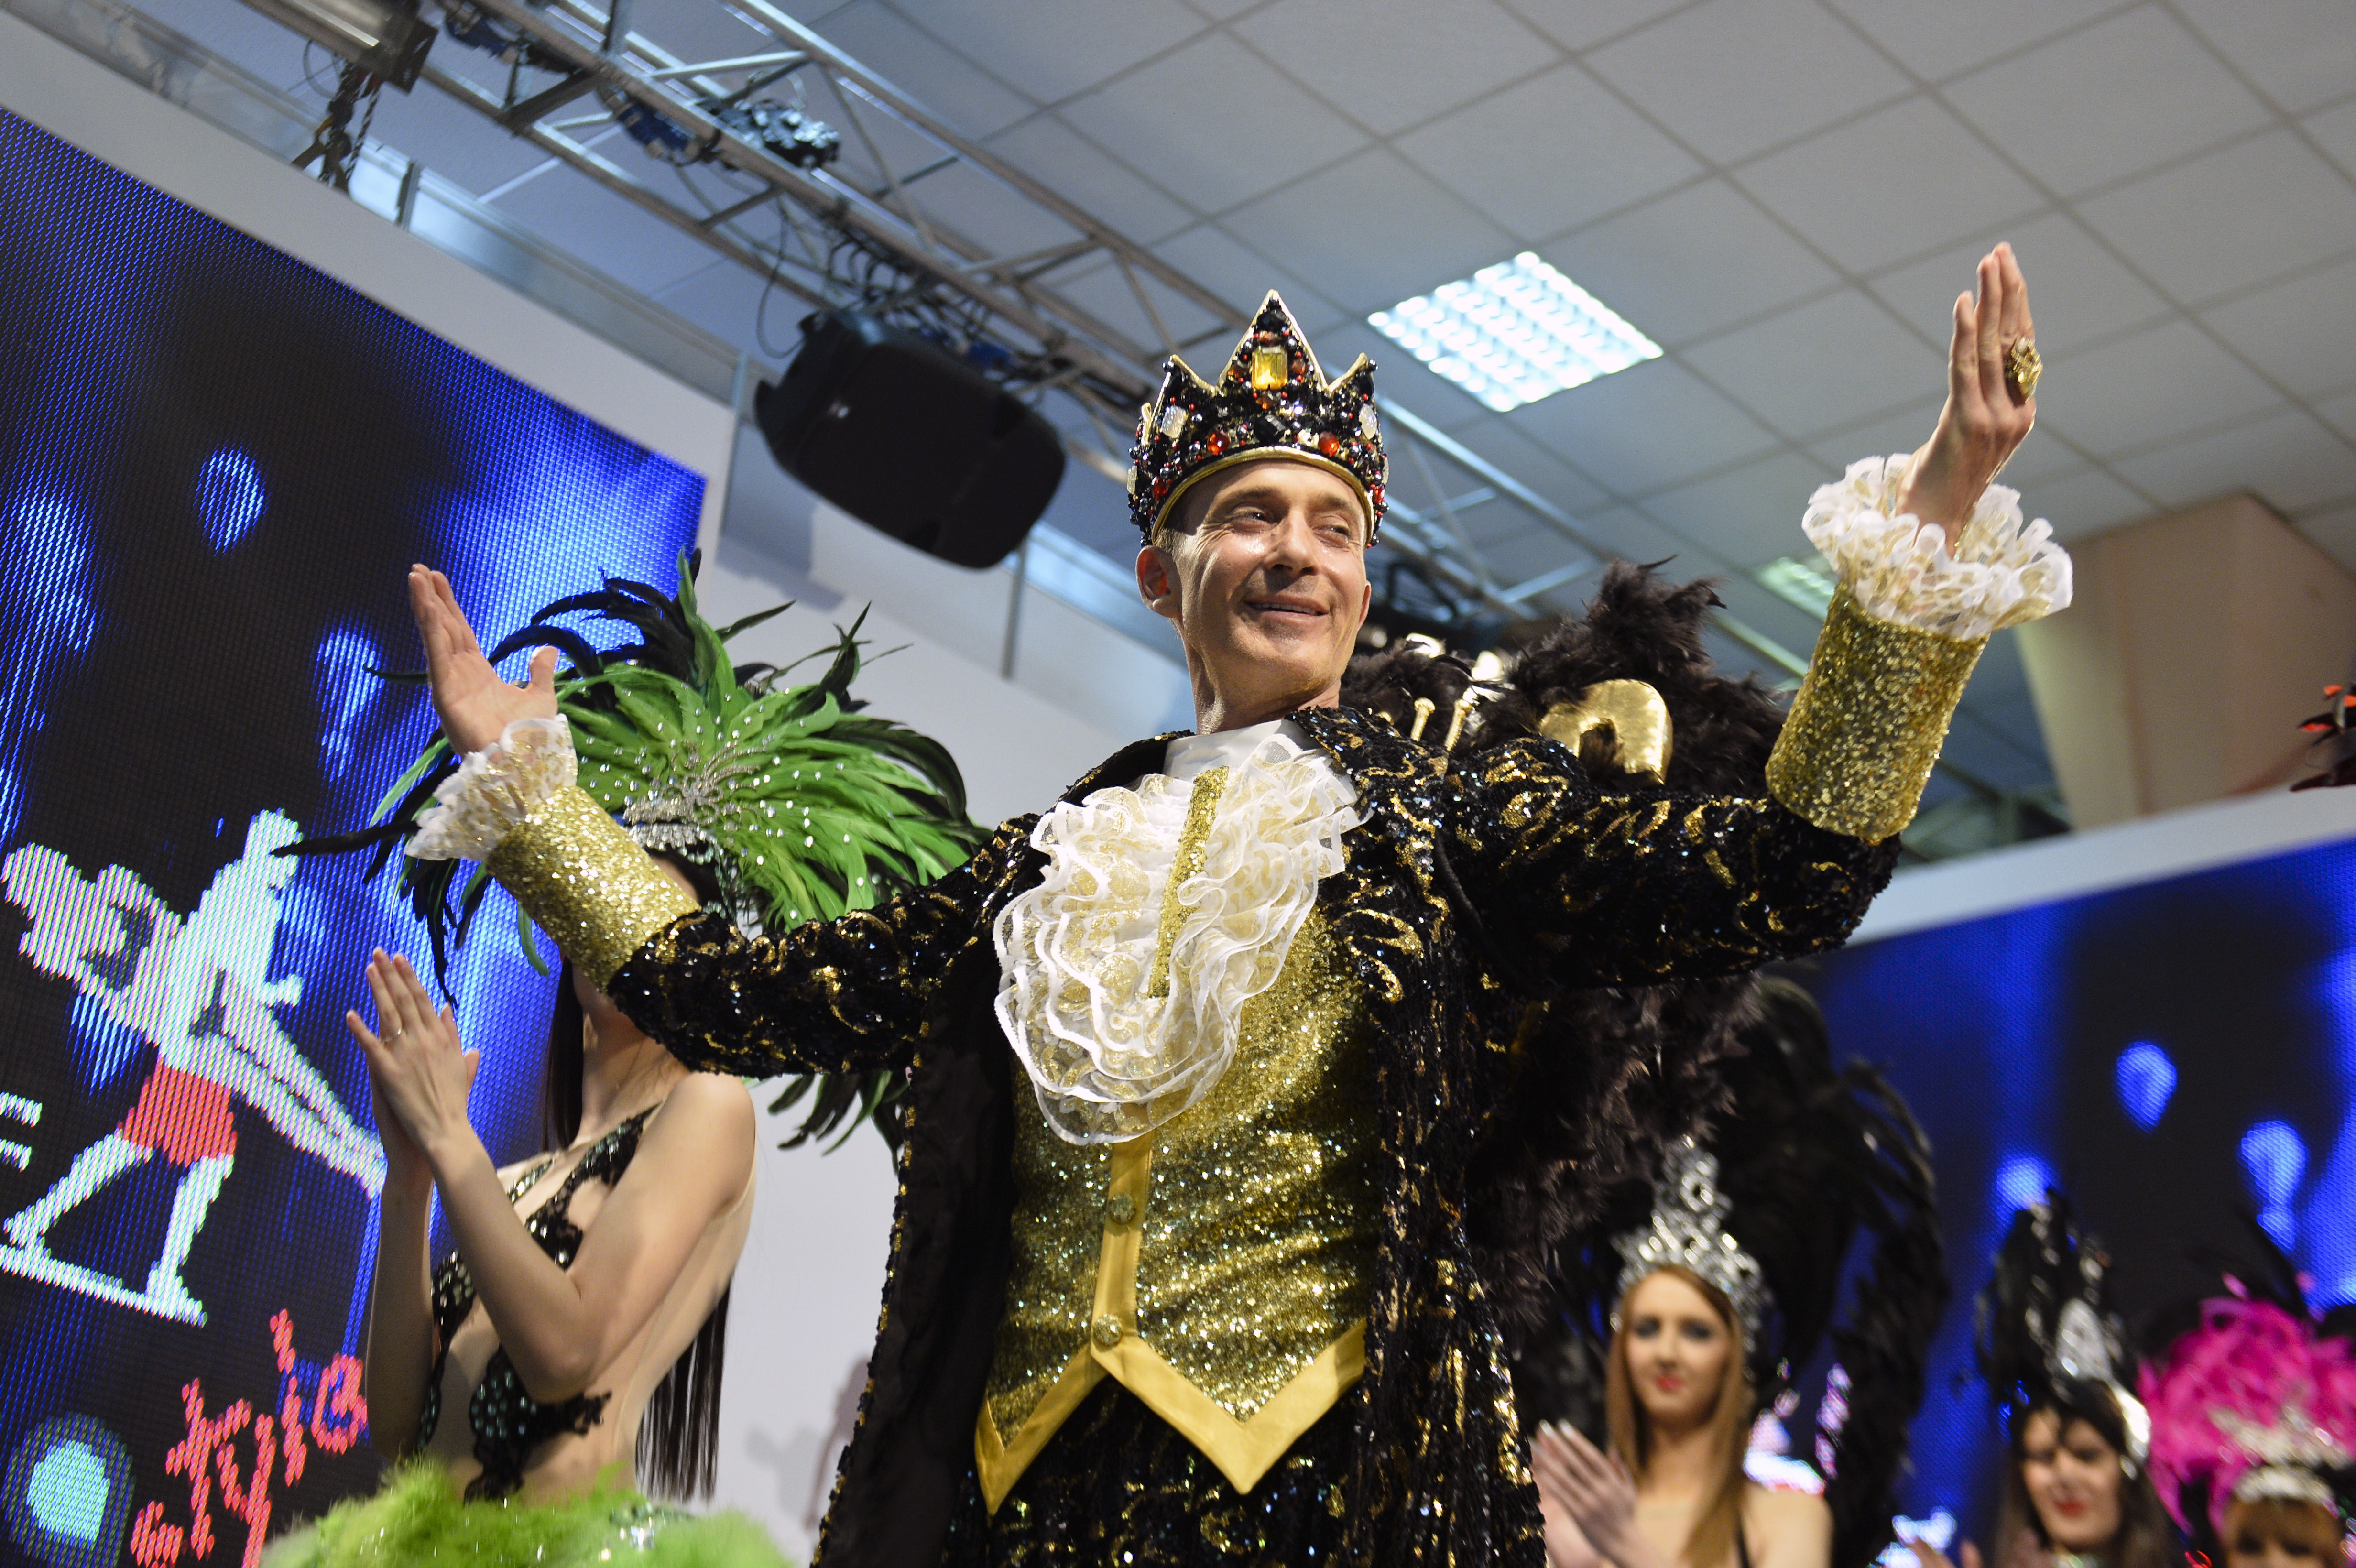 Carnaval cum nu s-a mai vazut, la Mamaia. Radu Mazare cauta